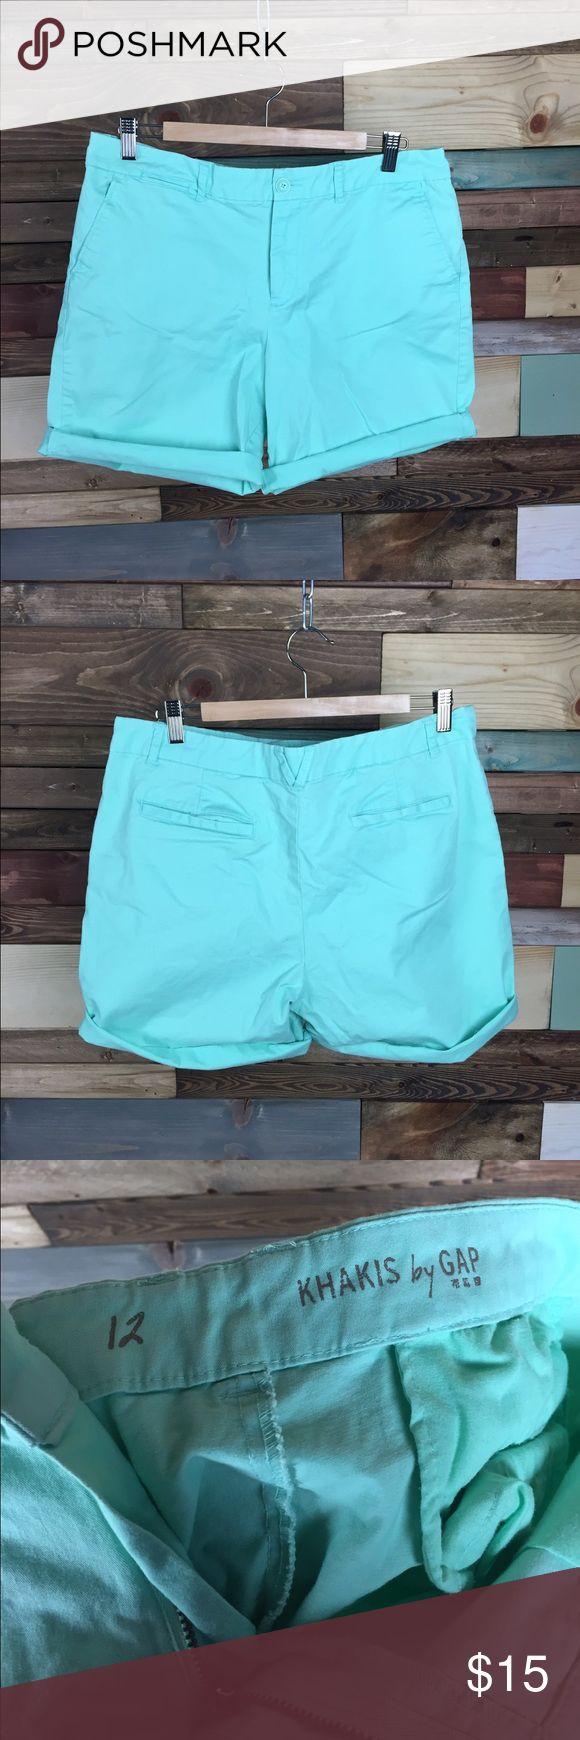 "Gap Mint Green Bermuda Roll up Shorts - 12 Gap Mint Green Bermuda Roll up Shorts - 12  Lightly distressed, perfect for vacation! Comfortable &  flattering high rise  Waist (laying flat): 18"" Inseam: 8"" Rise: 10""  #mintgreen  #vacation #woodsnap #vacation #summer #shorts #longshorts #bermudashorts #rollupshorts #highriseshorts #highwaistedshorts #longshorts #modest #comfortable #casualchic GAP Shorts Bermudas"